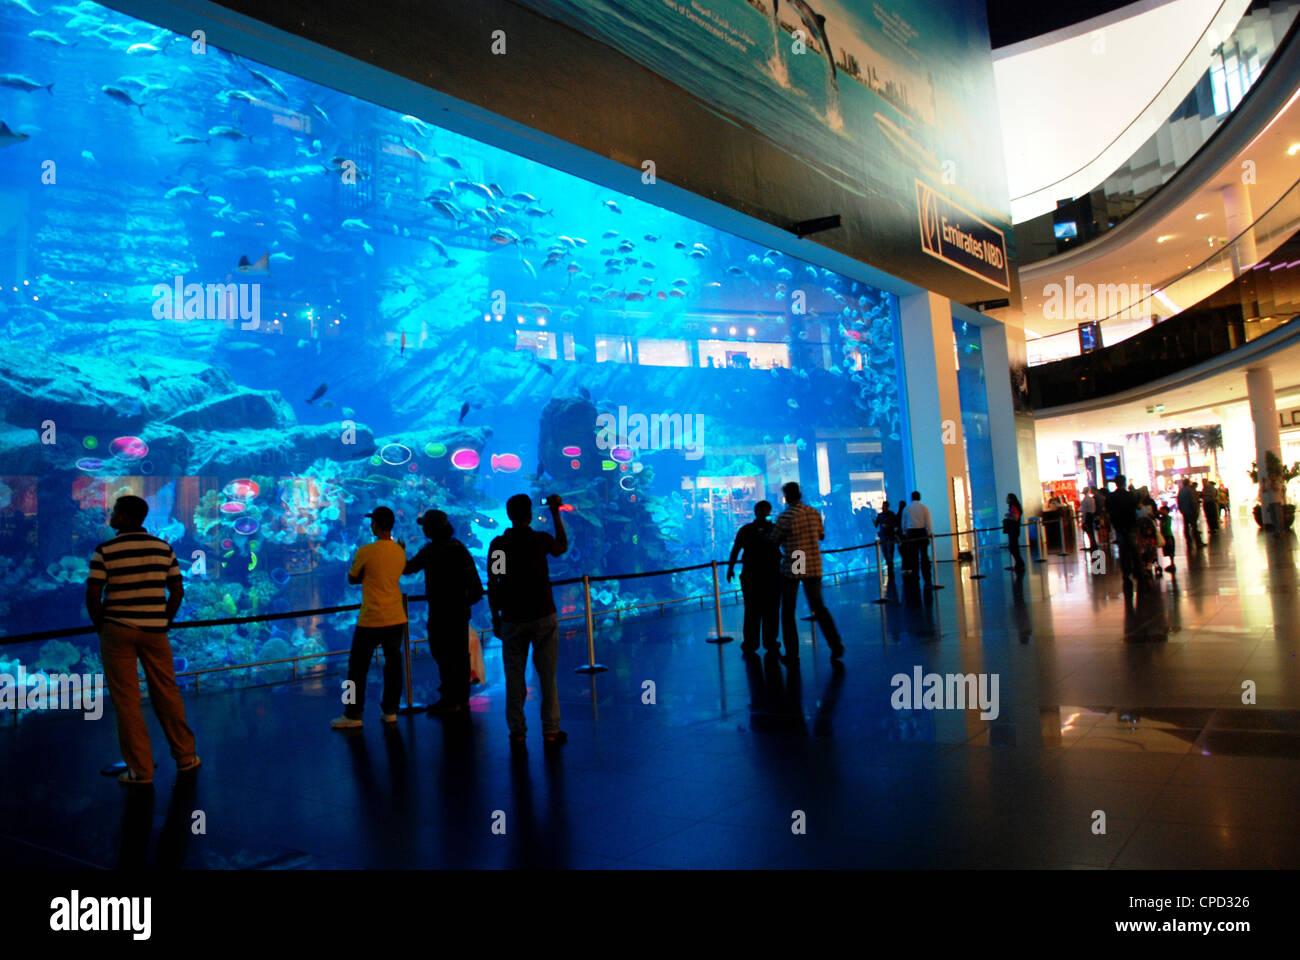 Inside The Burj Khalifa Dubai Stock Photo 48230958 Alamy